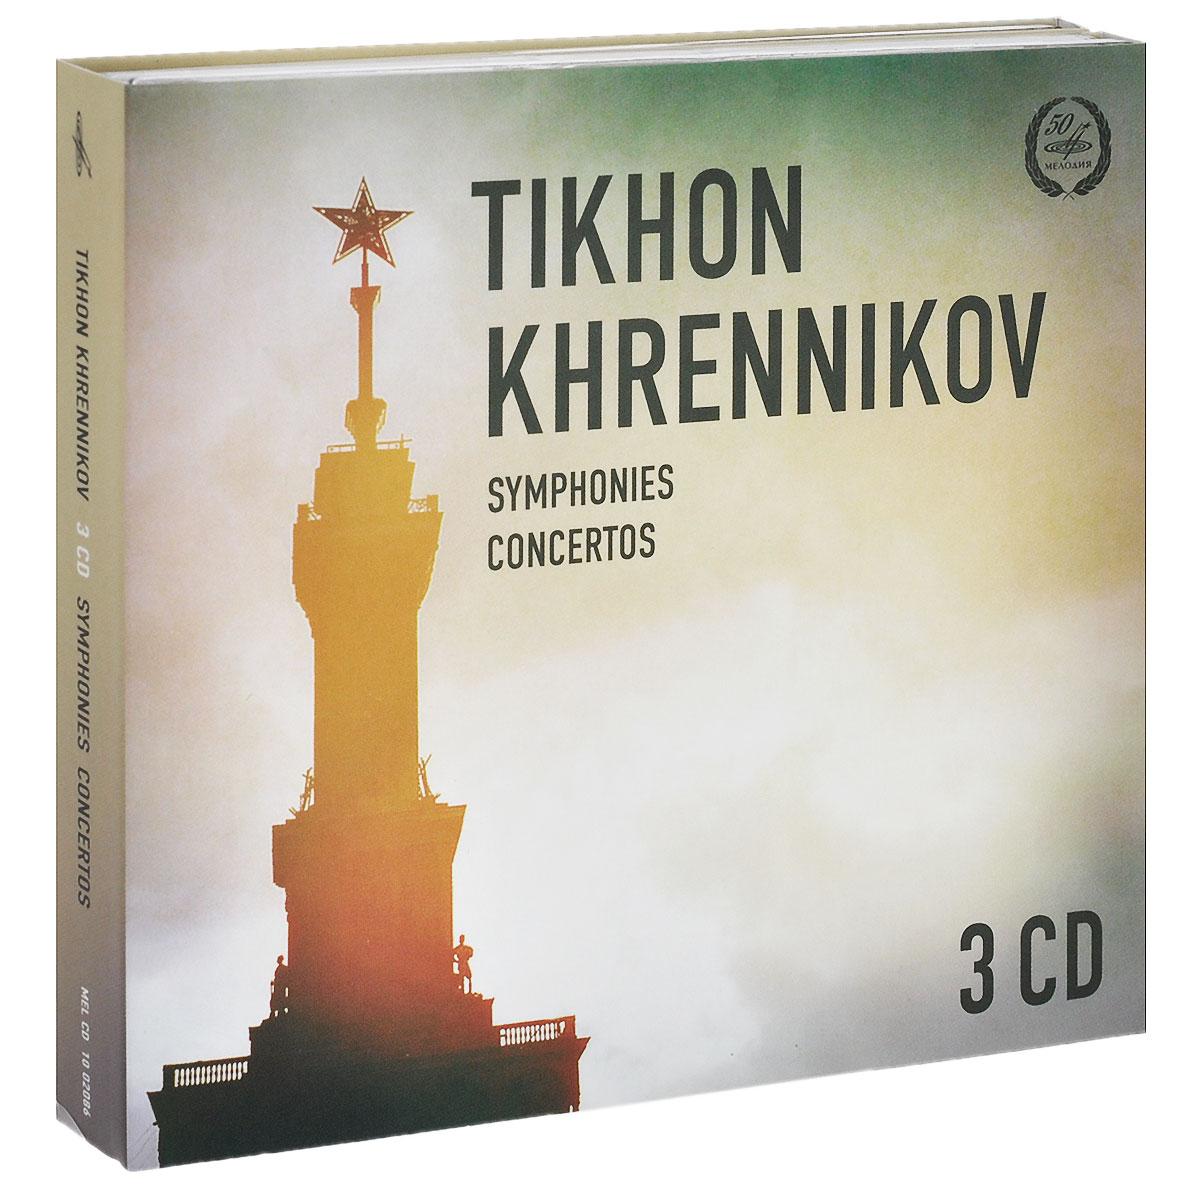 Tikhon Khrennikov. Symphonies. Concertos (3 CD)